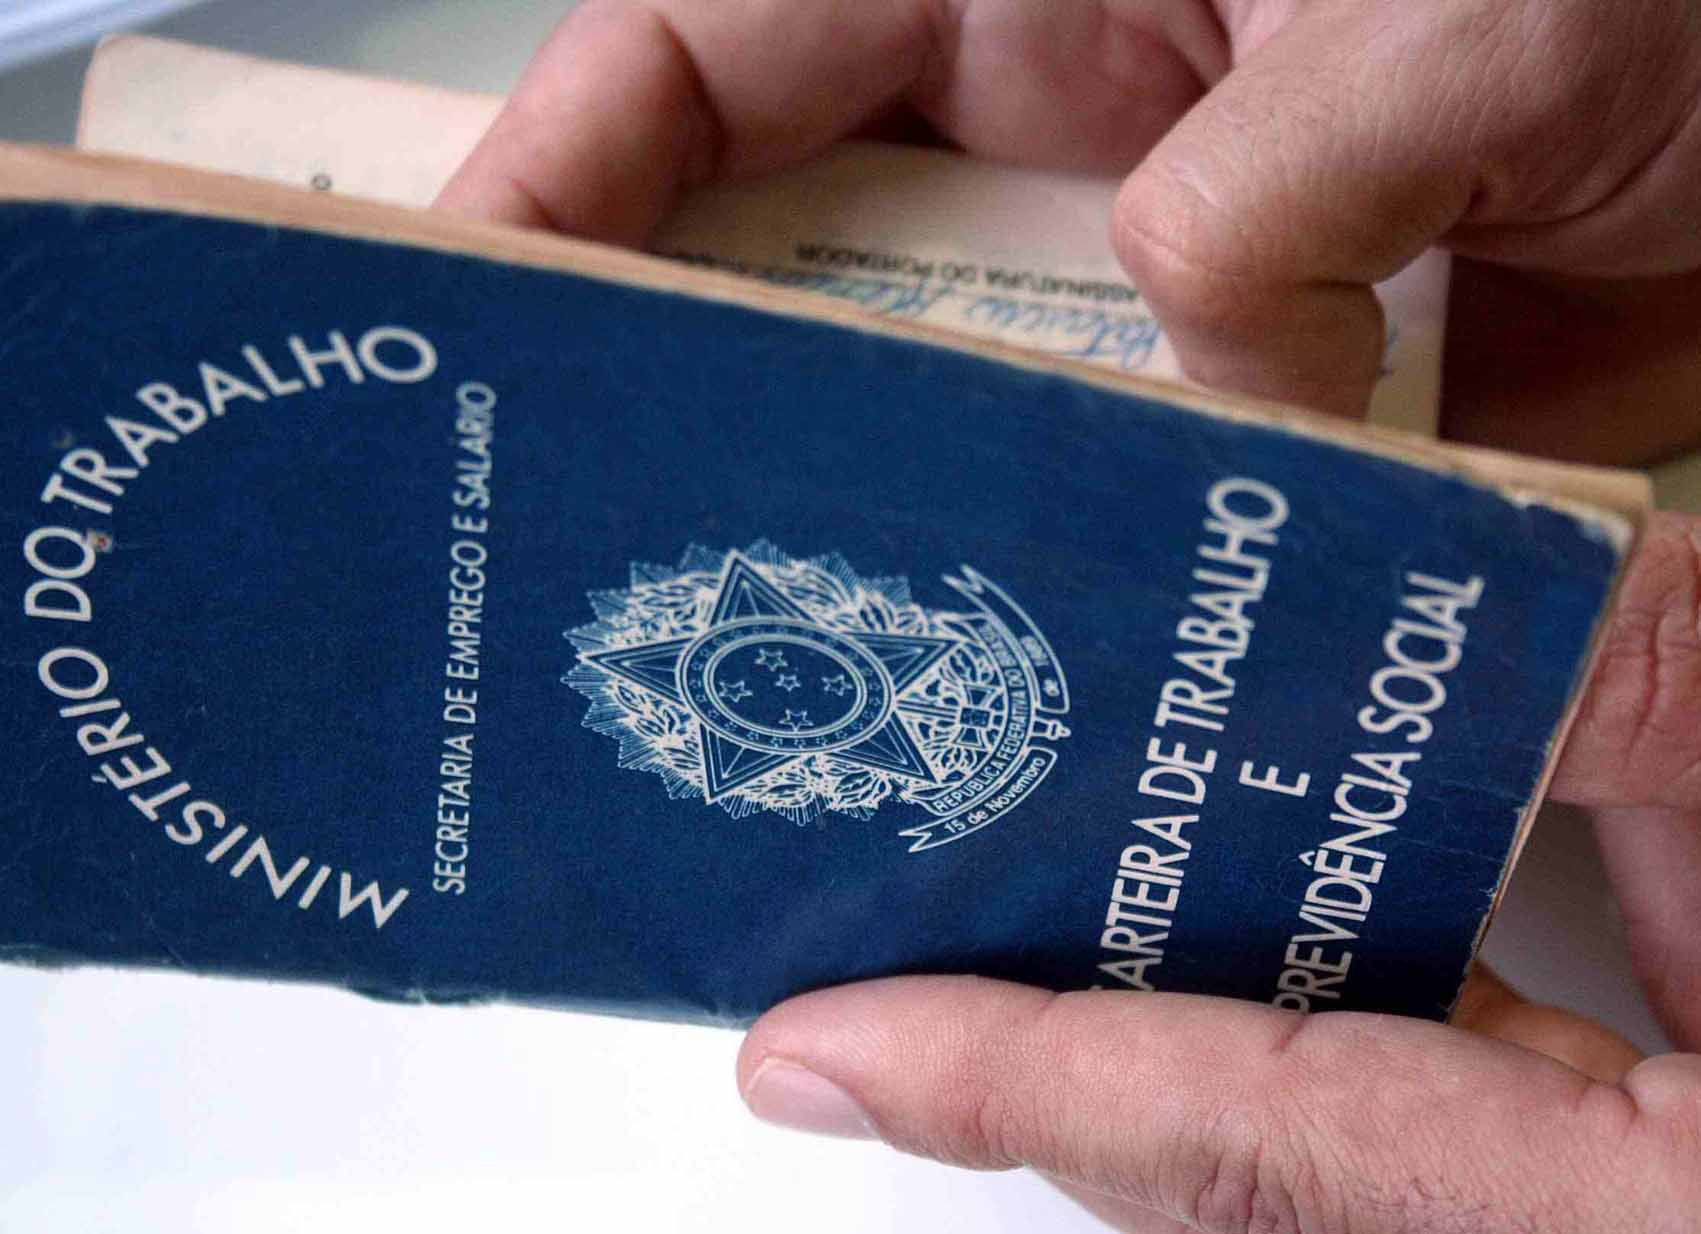 Cepat Joinville divulga vagas de emprego